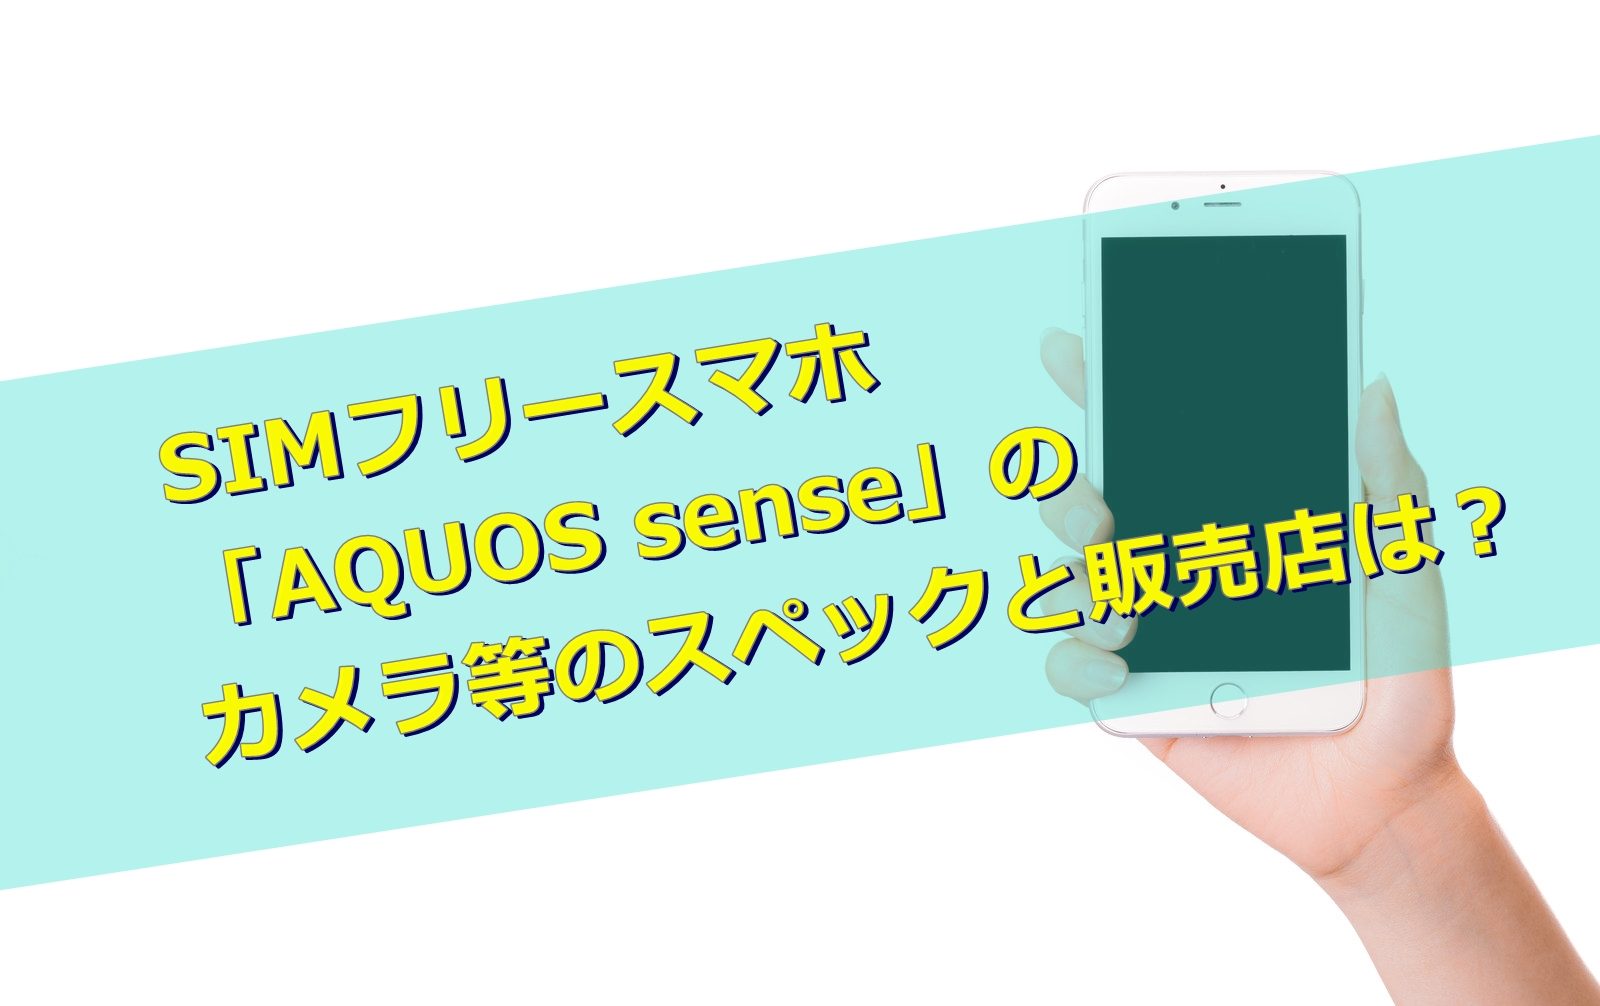 SIMフリースマホ「AQUOS sense lite」のカメラ等のスペックと販売店は?